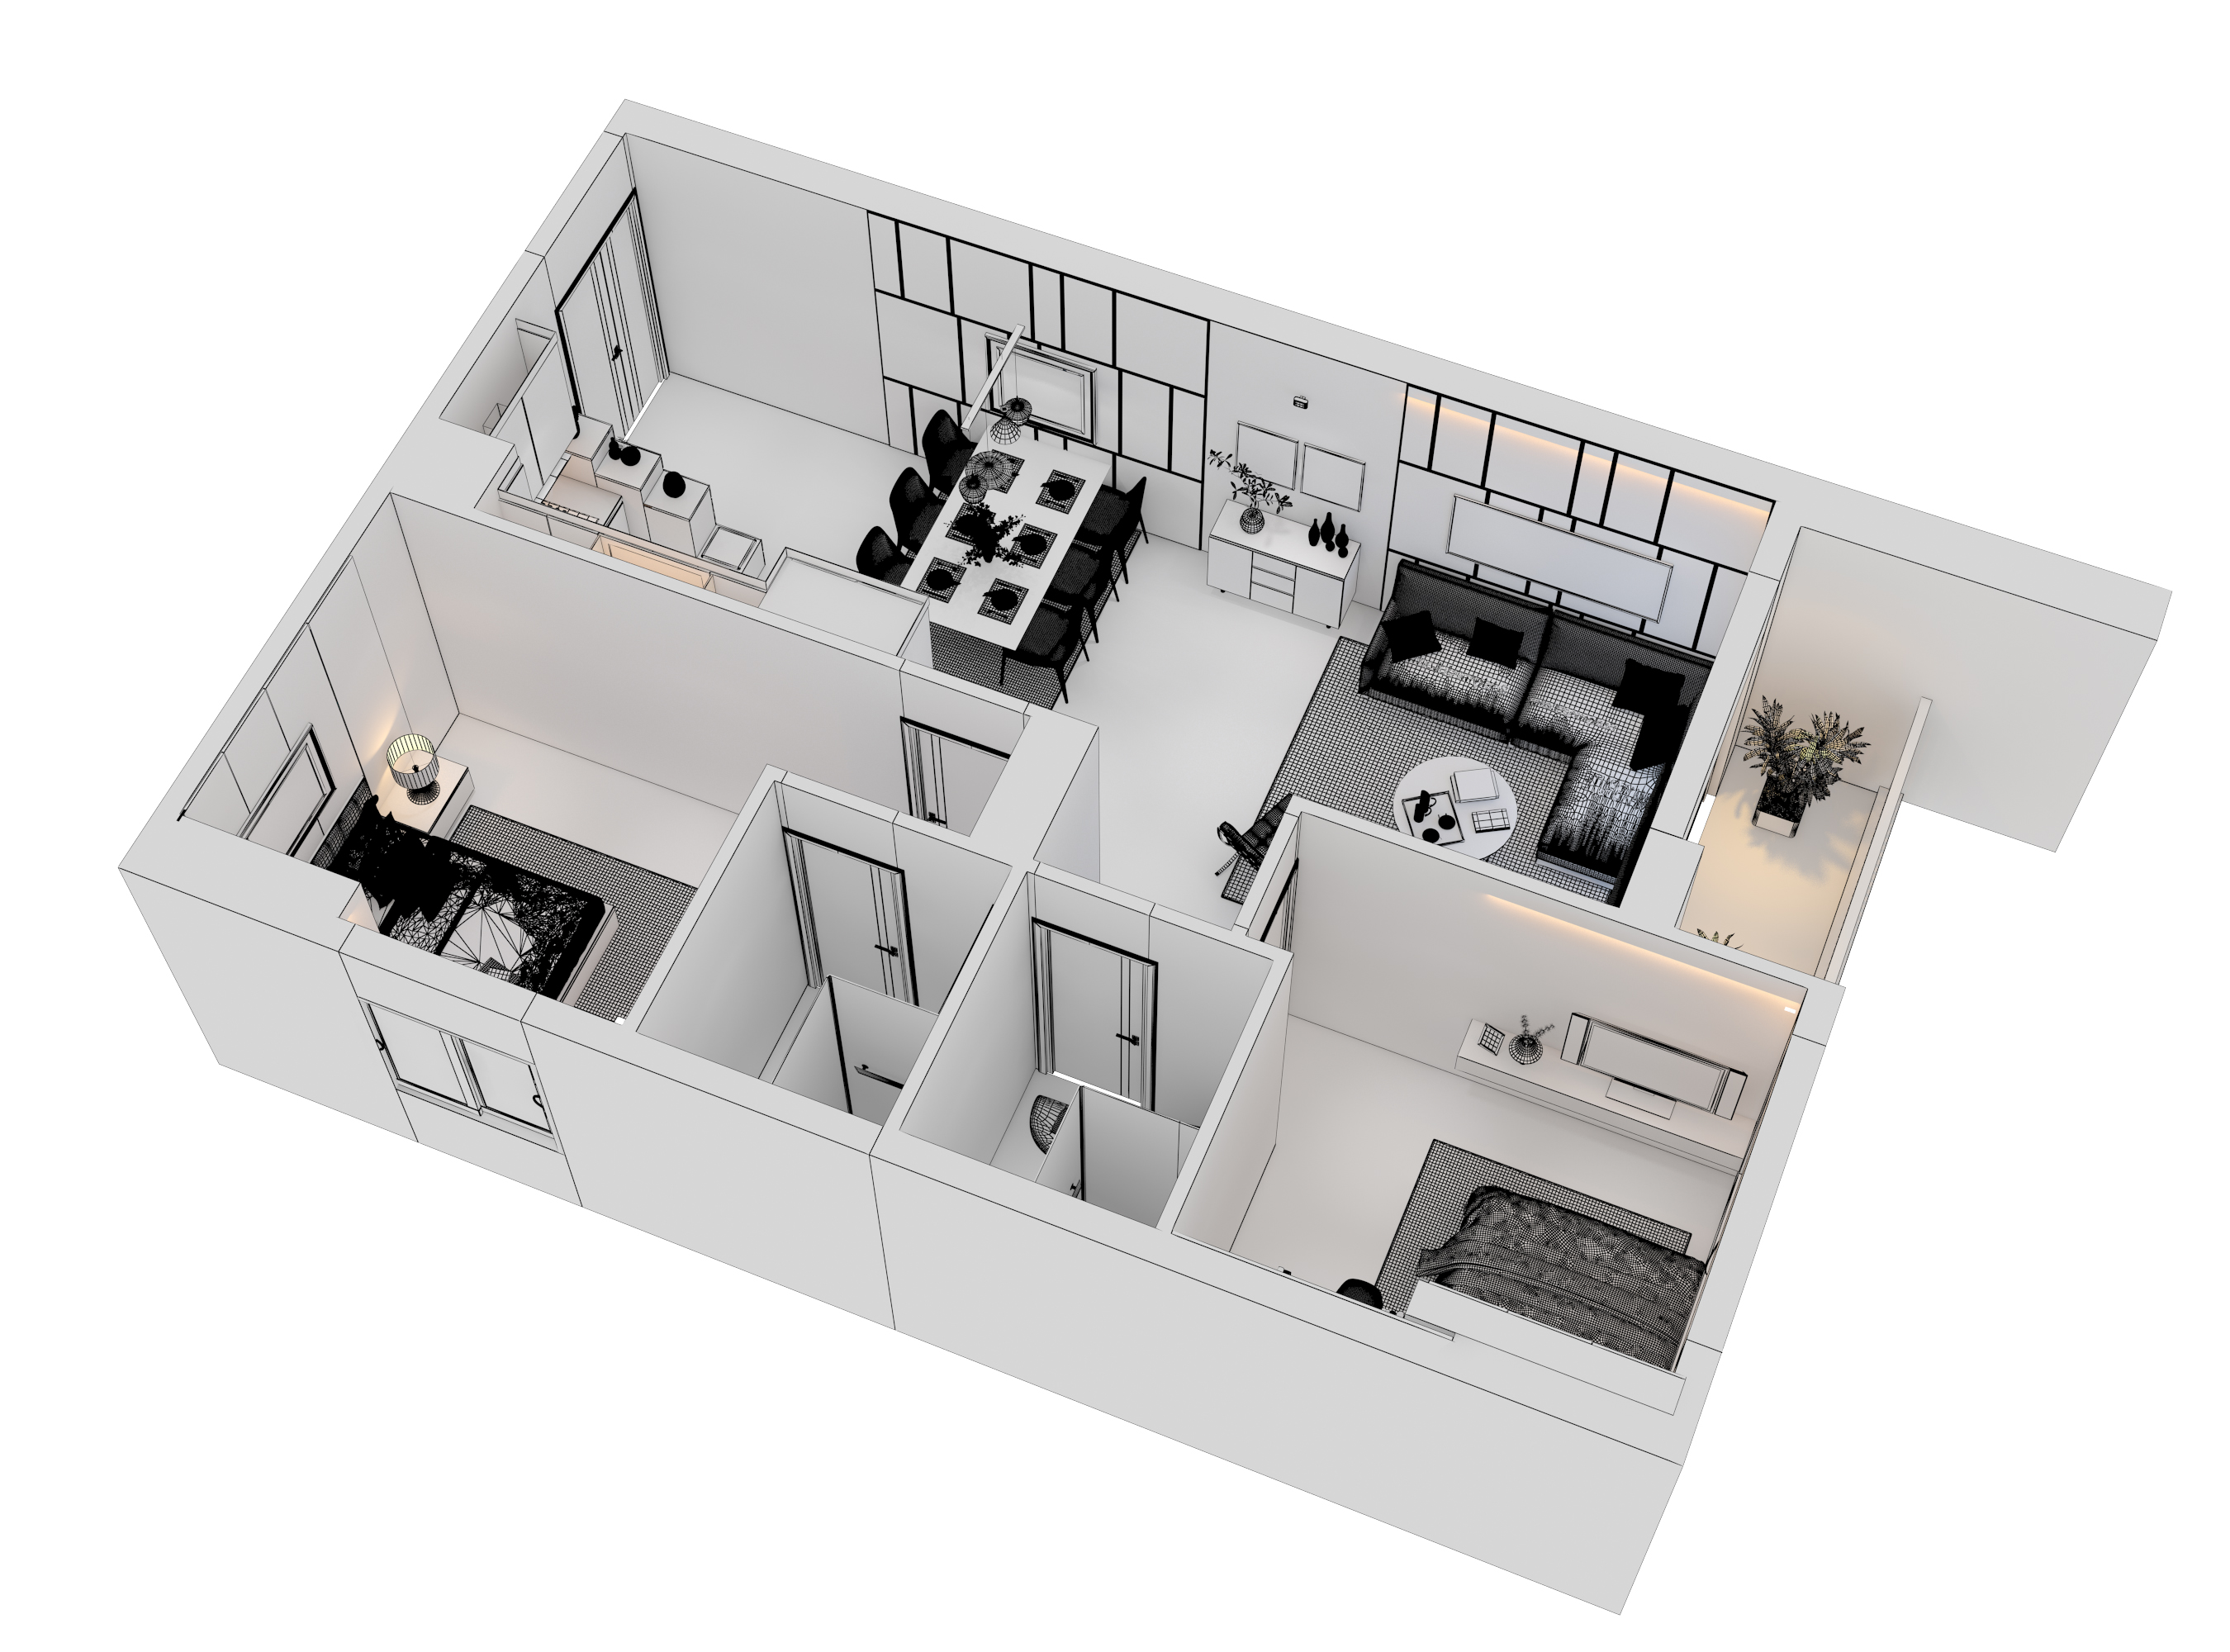 Cutaway apartment full furnitures modern design 3d model max 279964